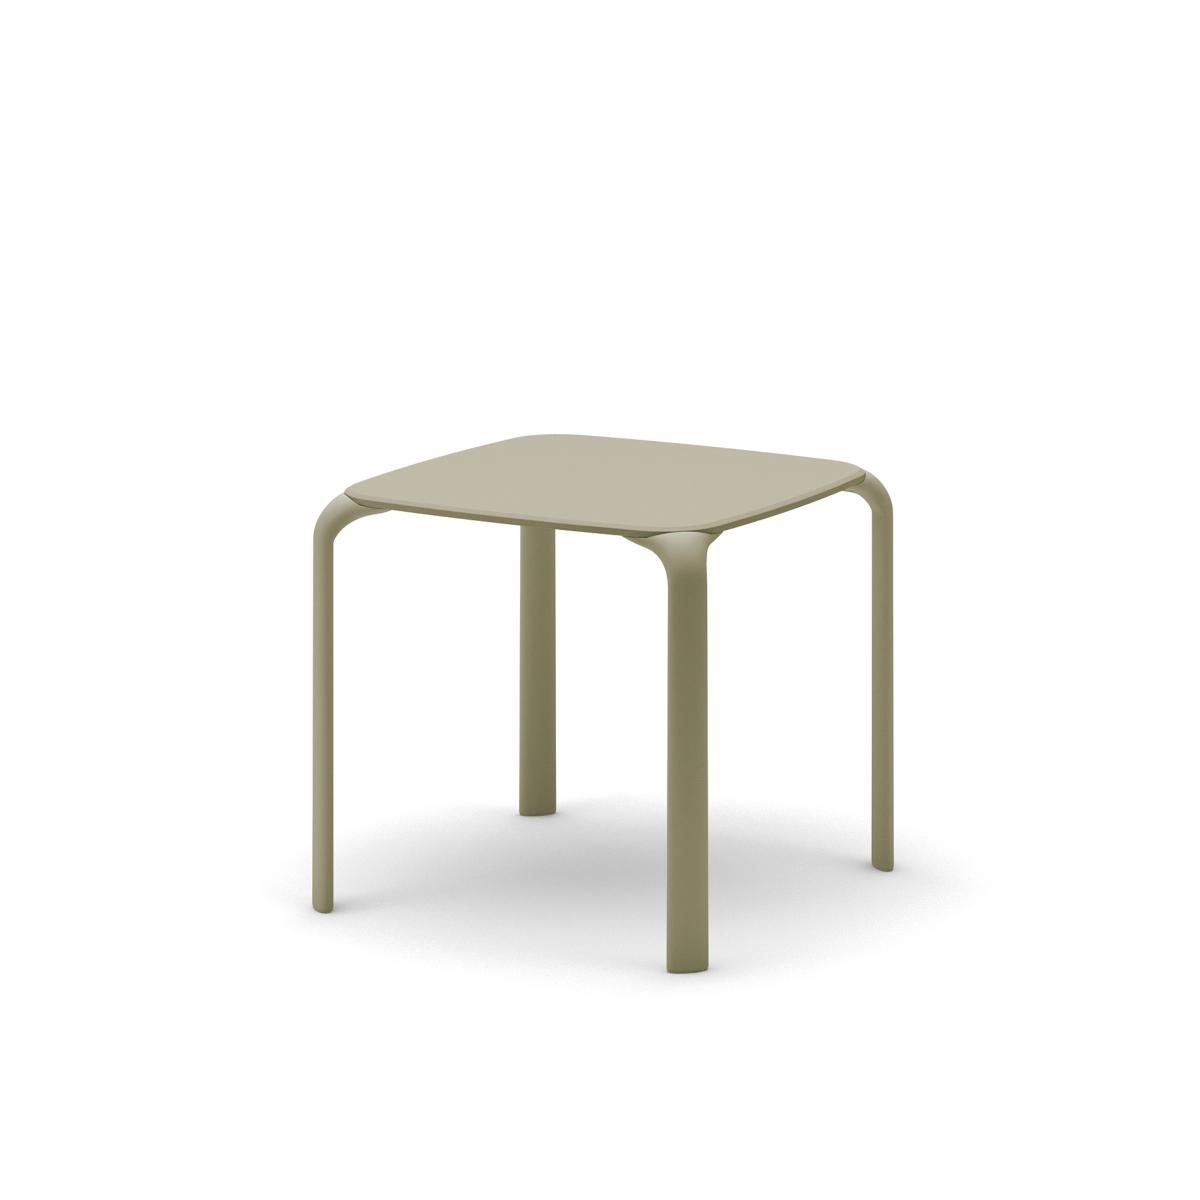 Infiniti Design, Drop table